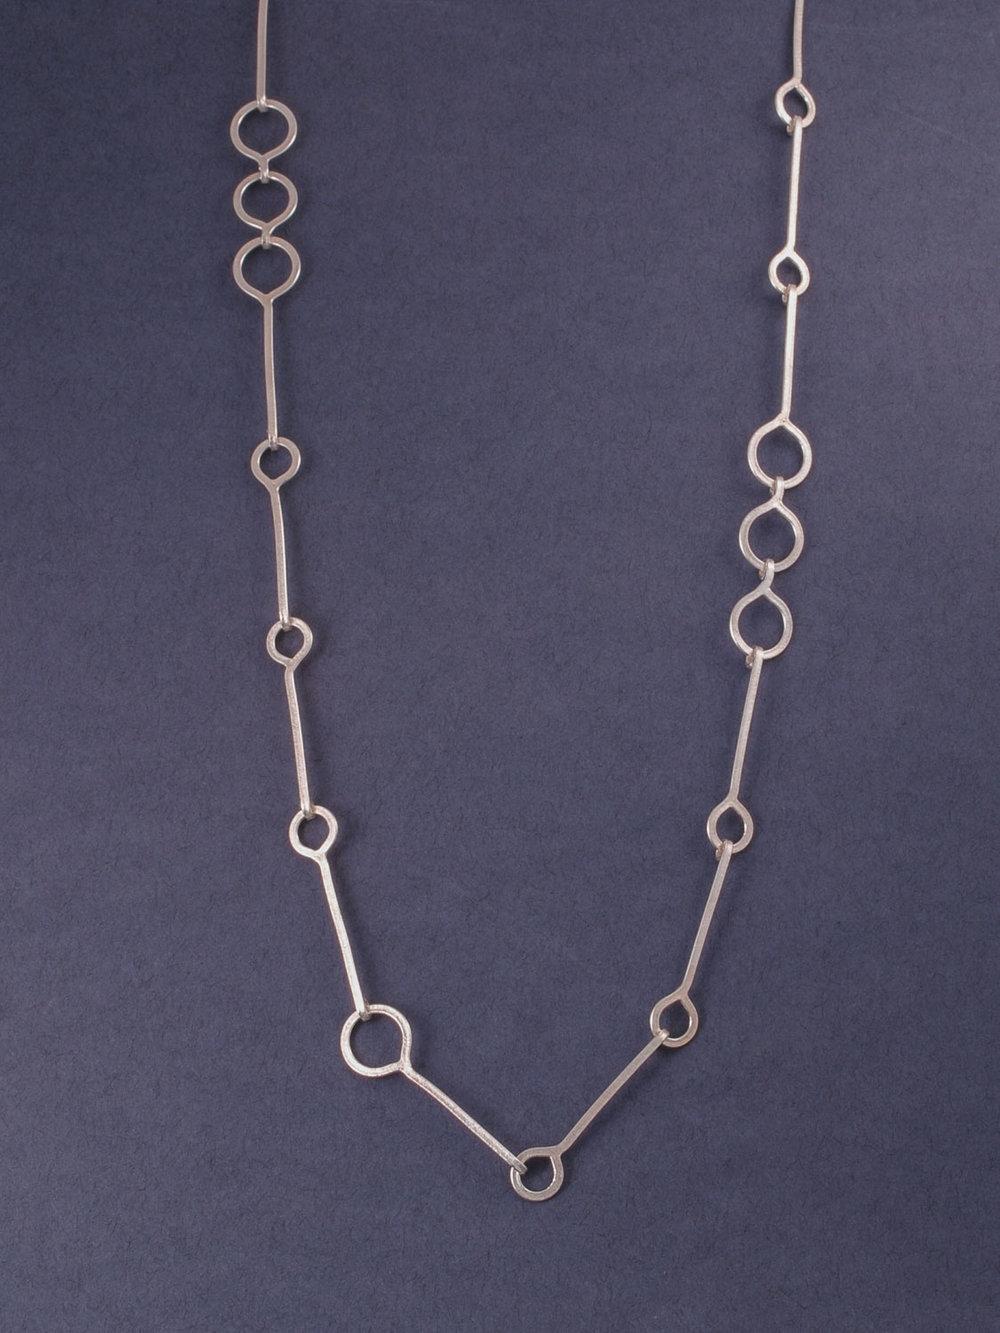 stem link chain